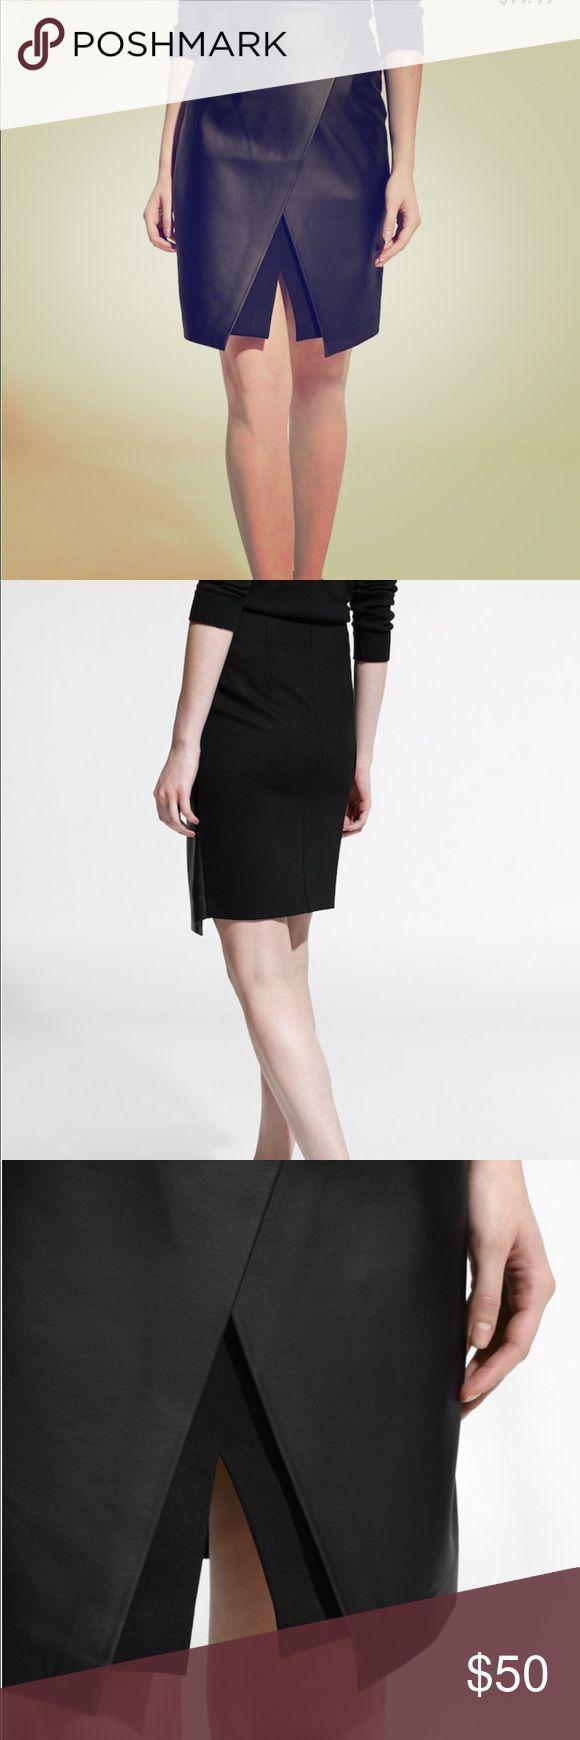 *NWT* Faux Leather Slit Wrap Skirt Size XXS *NWT* Faux Leather Slit Wrap Skirt Size XXS Mango Skirts